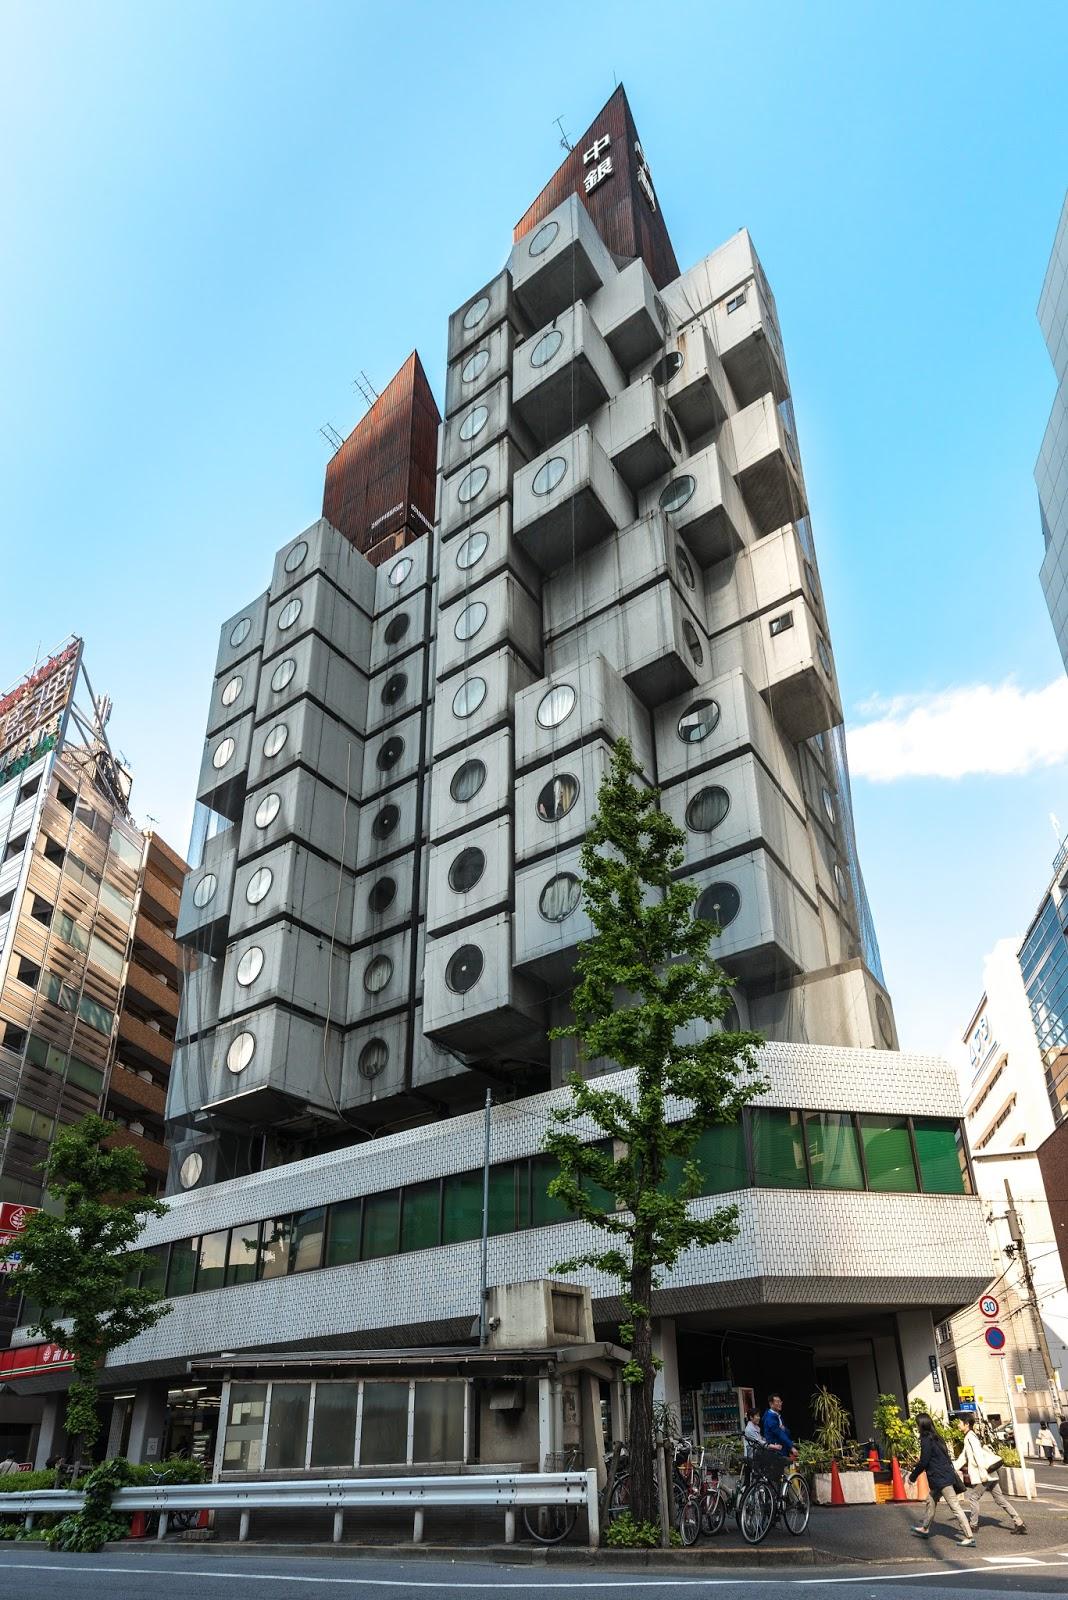 japan architecture japanese metabolism buildings lego nakagin rife wonderful delightful evasive knows alice could